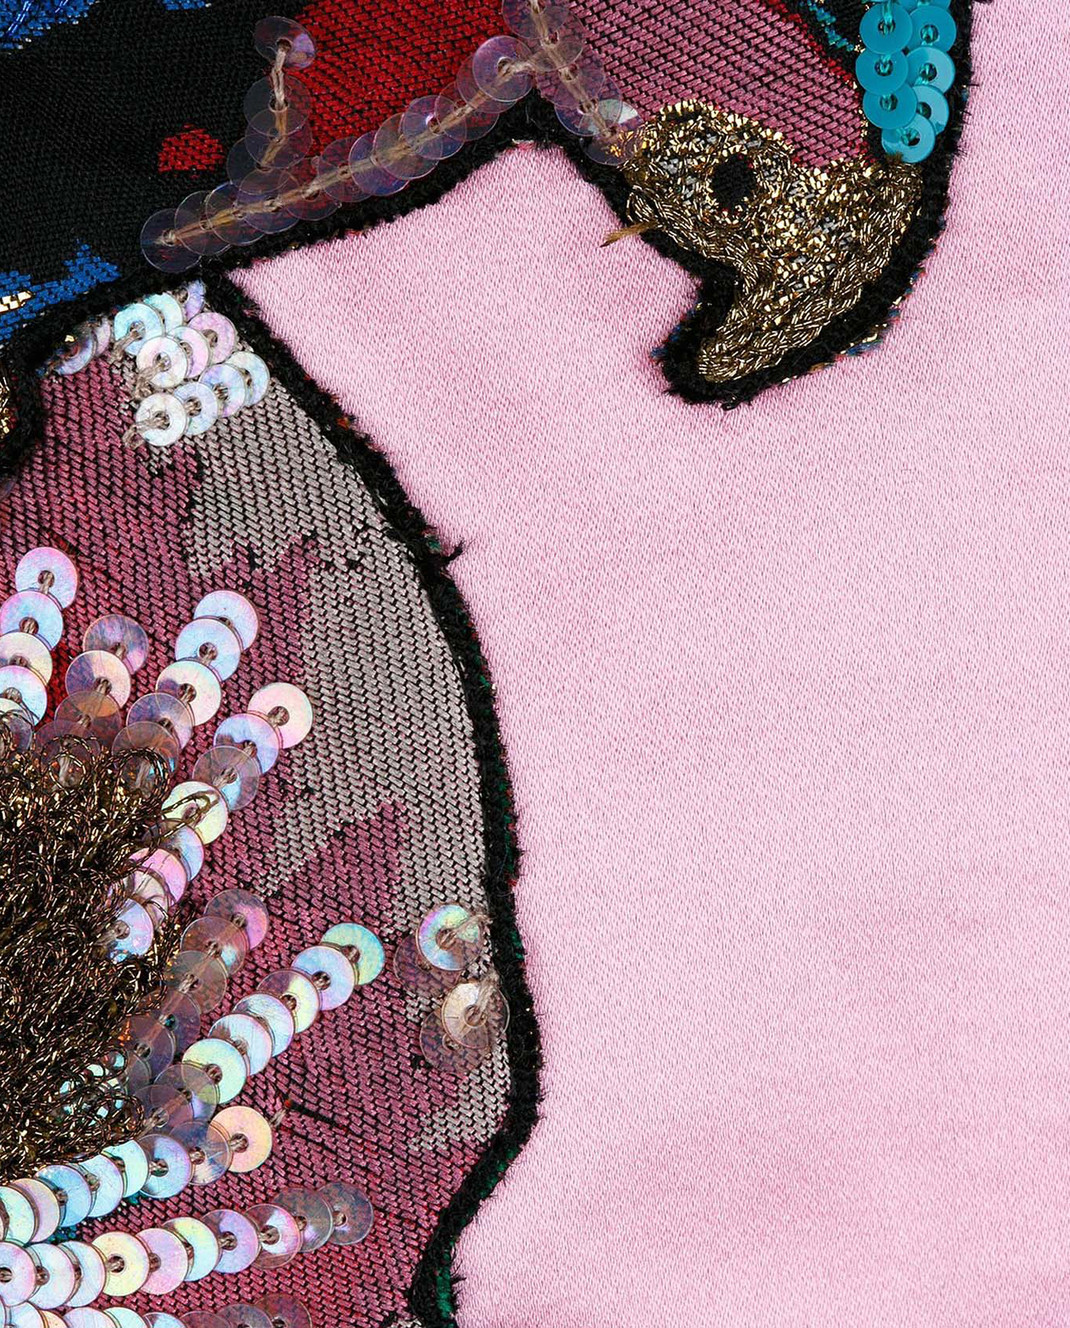 Valentino Розовый бомбер из шелка MBCCI0150HM изображение 5